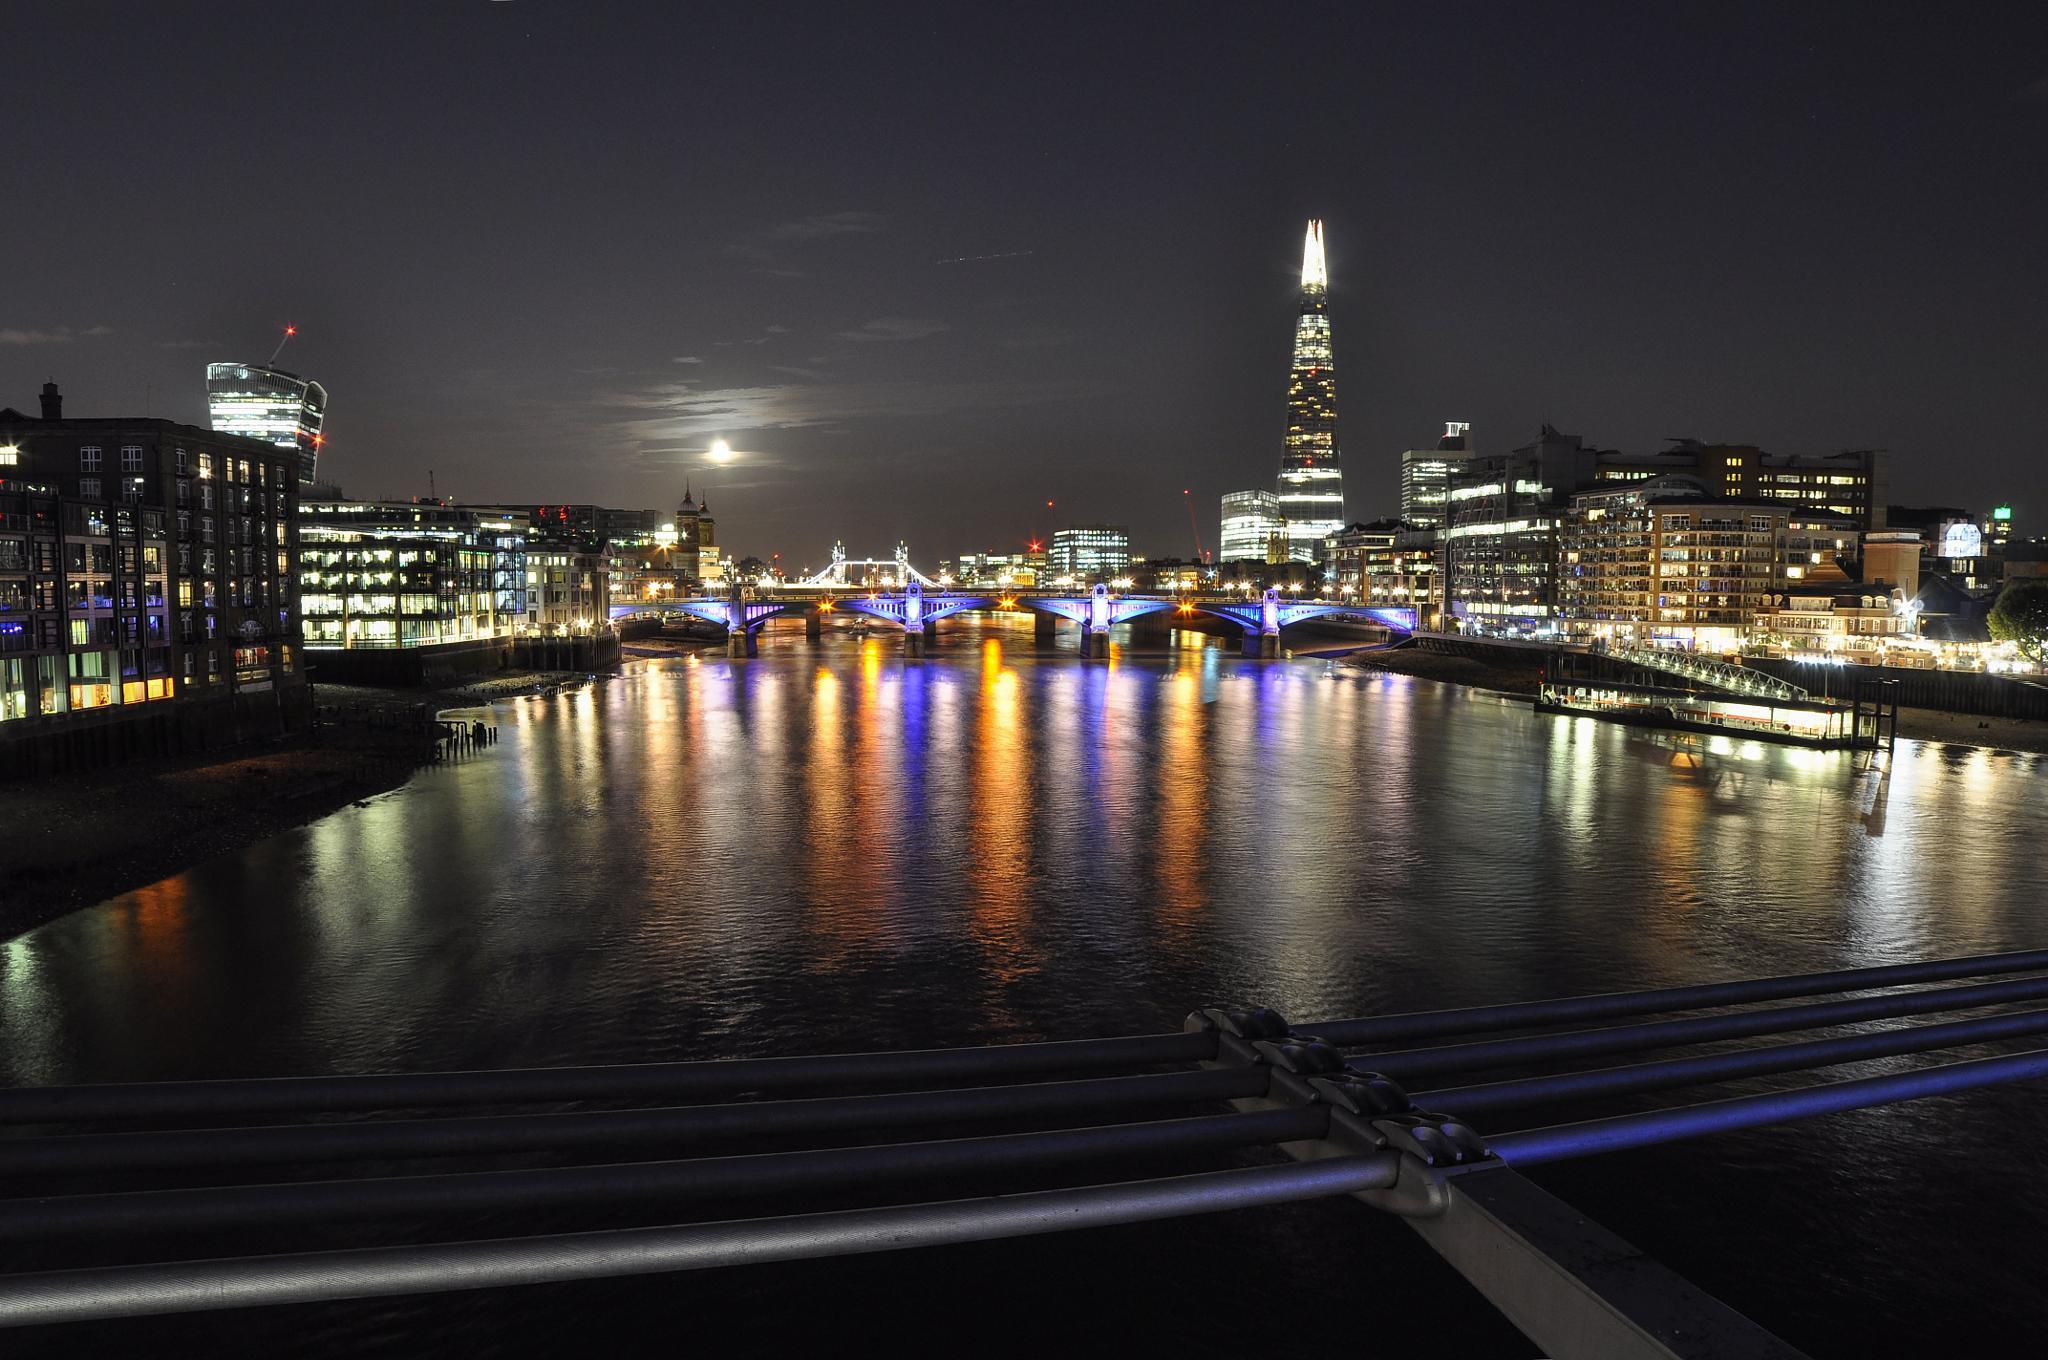 Londra by Enrico Pugliese